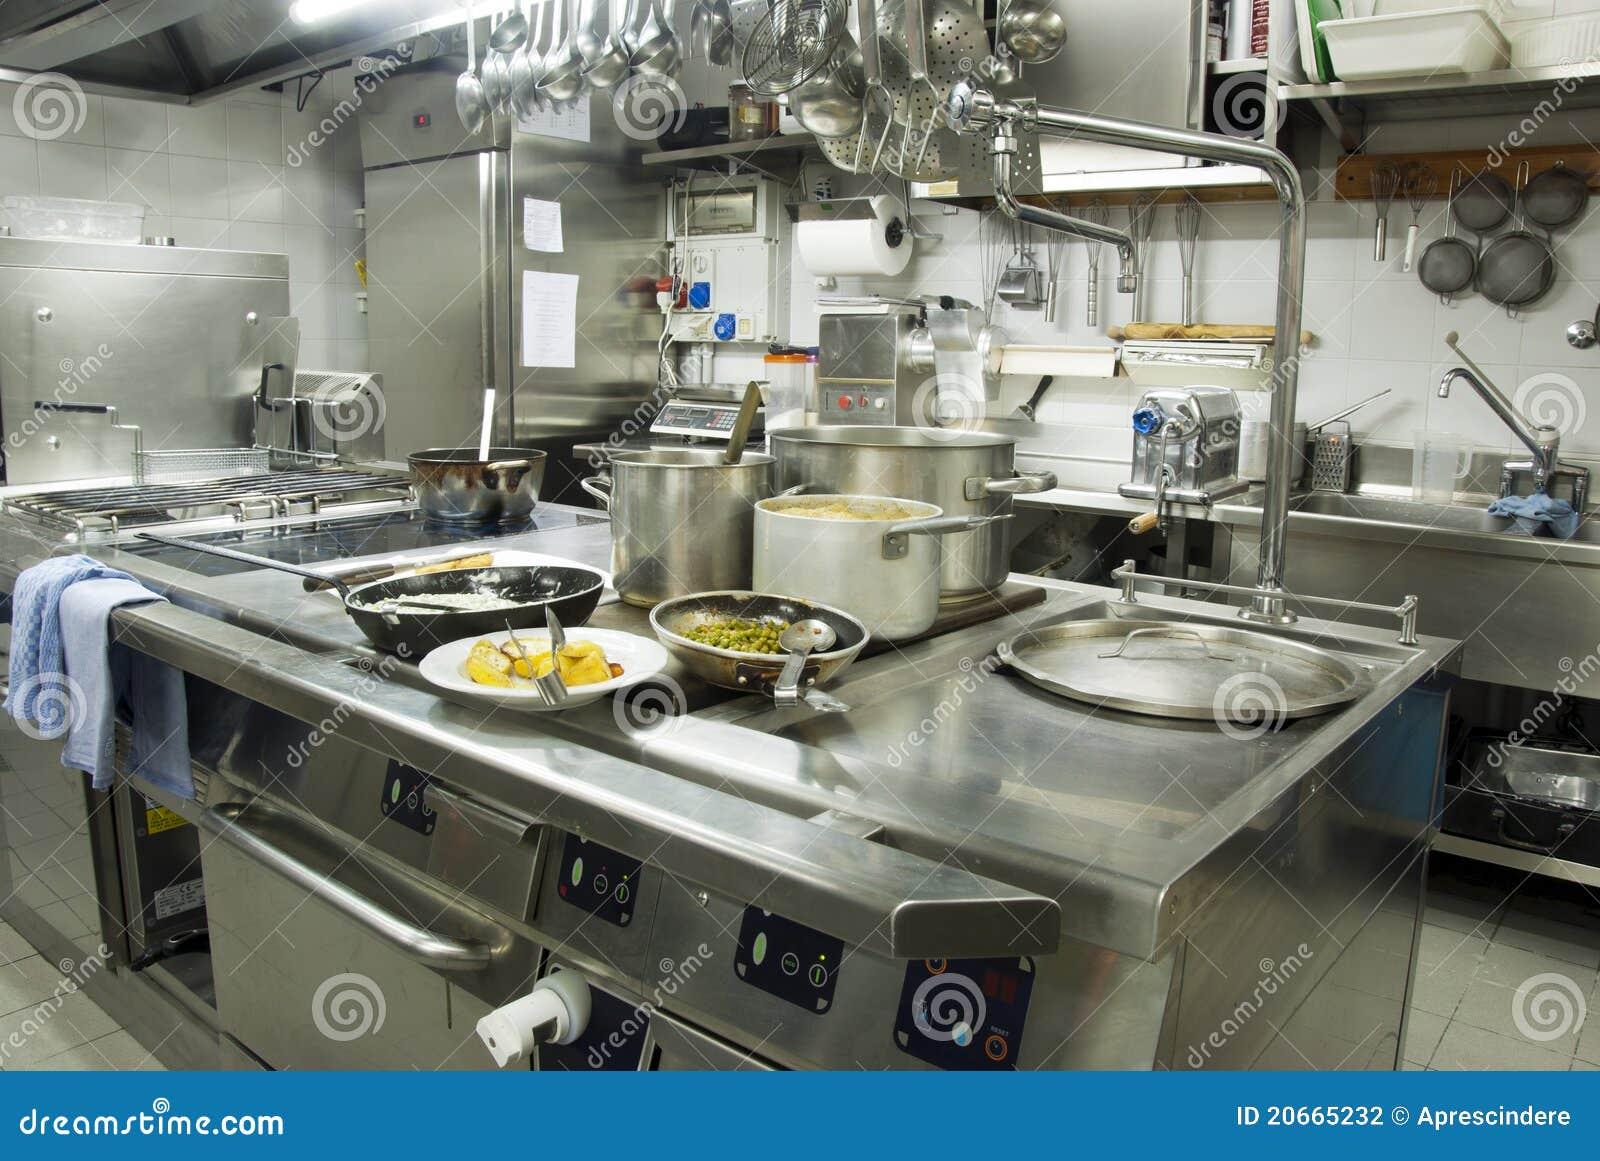 Cocina del restaurante for Cocina de restaurante